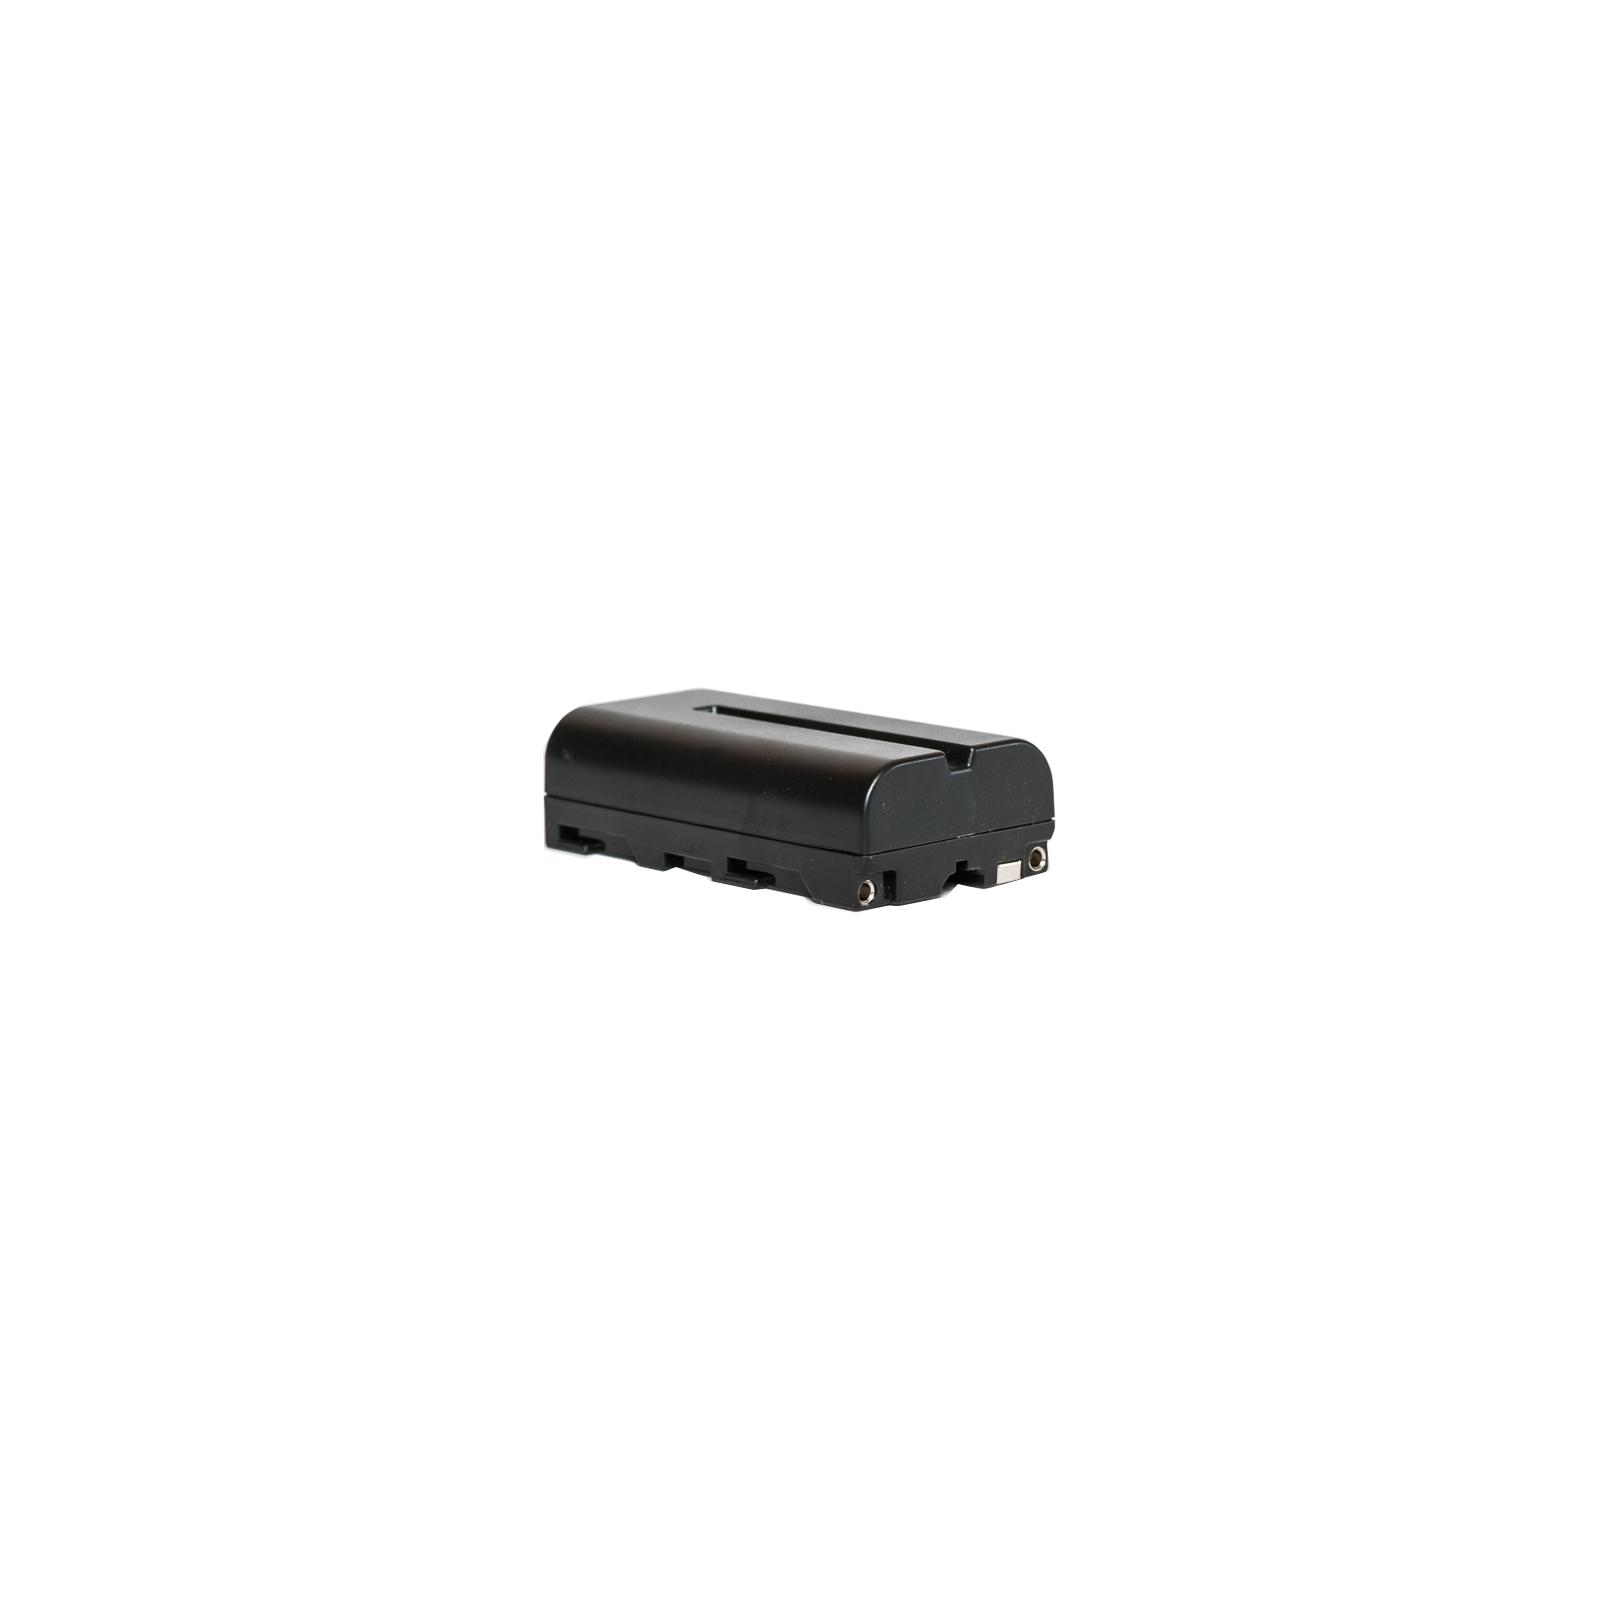 Аккумулятор к фото/видео PowerPlant Sony NP-F550 (DV00DV1031) изображение 2